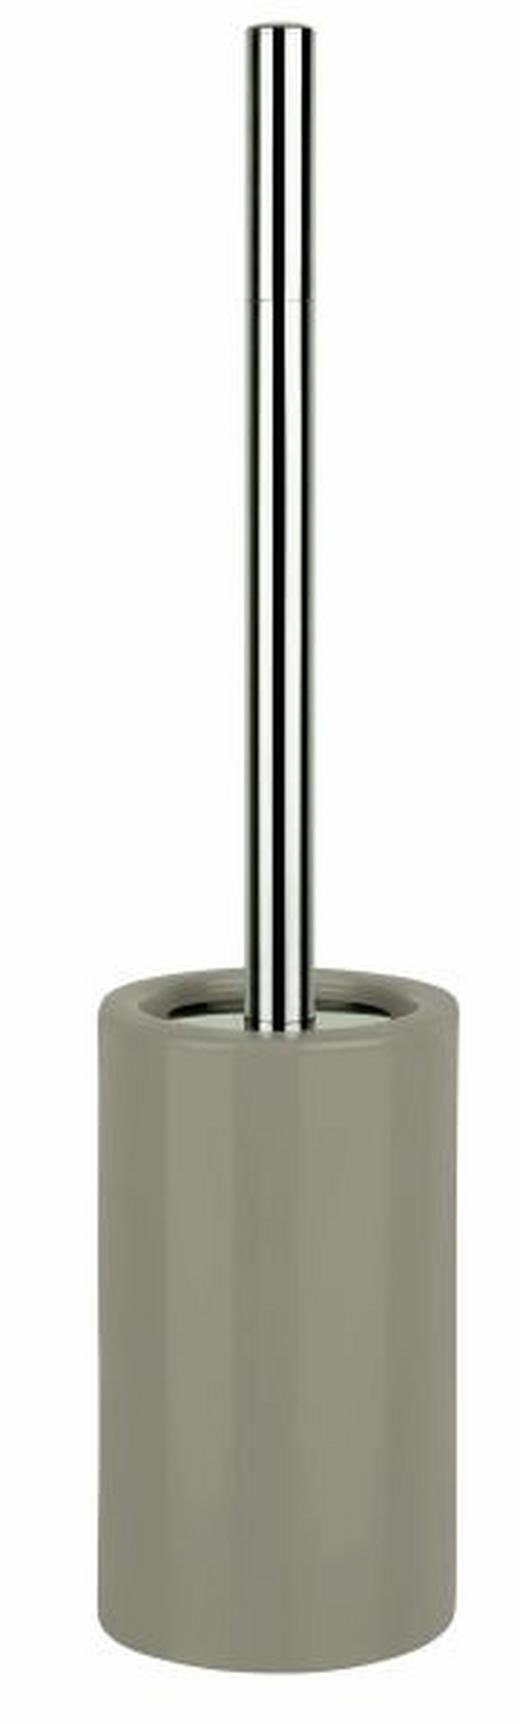 WC-BÜRSTENGARNITUR - Taupe/Silberfarben, Basics, Keramik/Kunststoff (10,5/42cm) - SPIRELLA